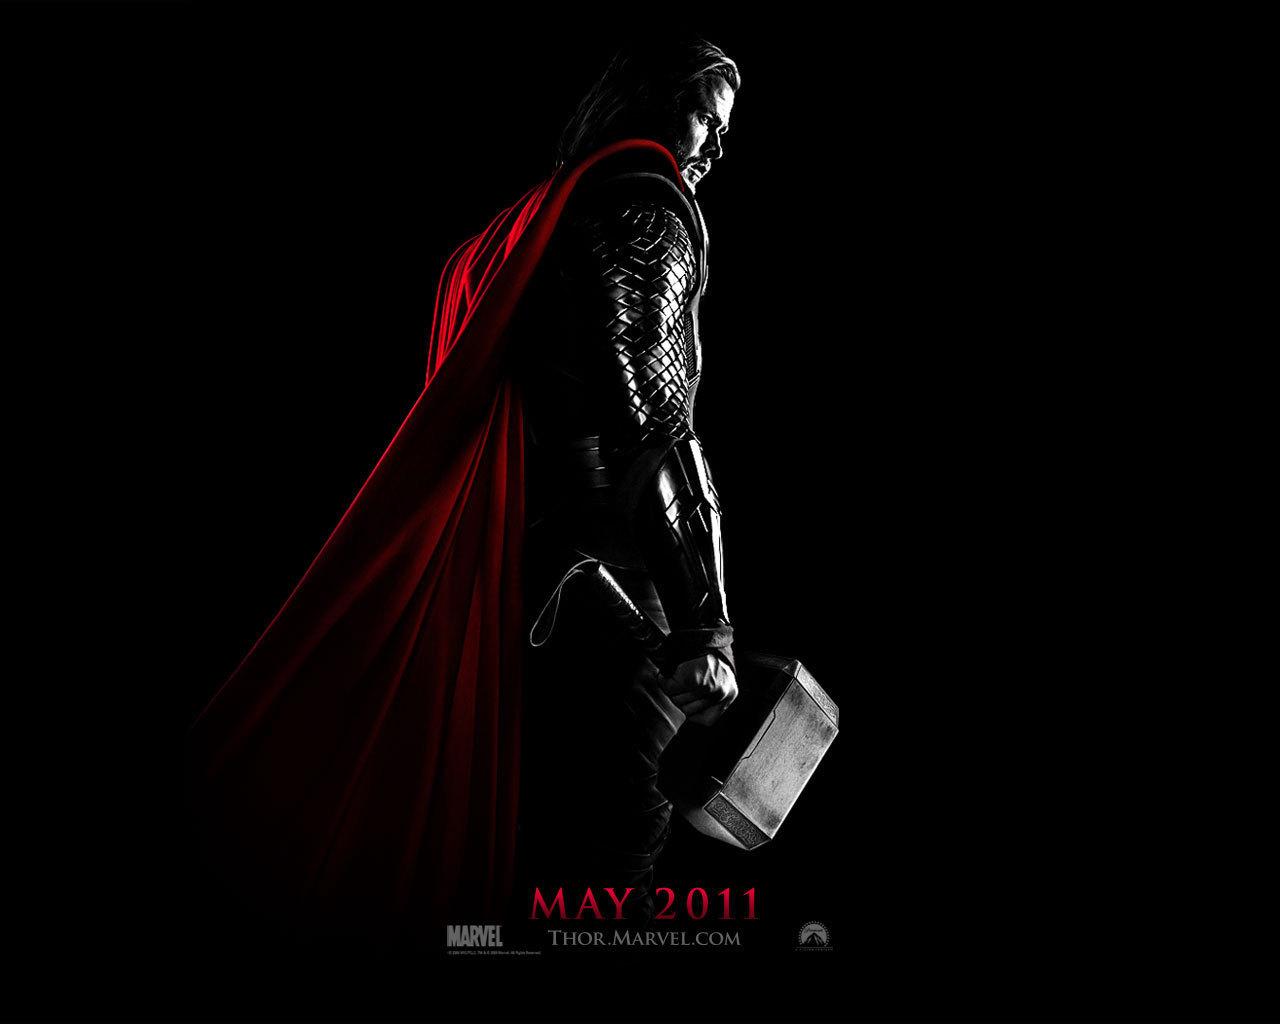 Thor Fighting Mobile Wallpaper Wallpaper